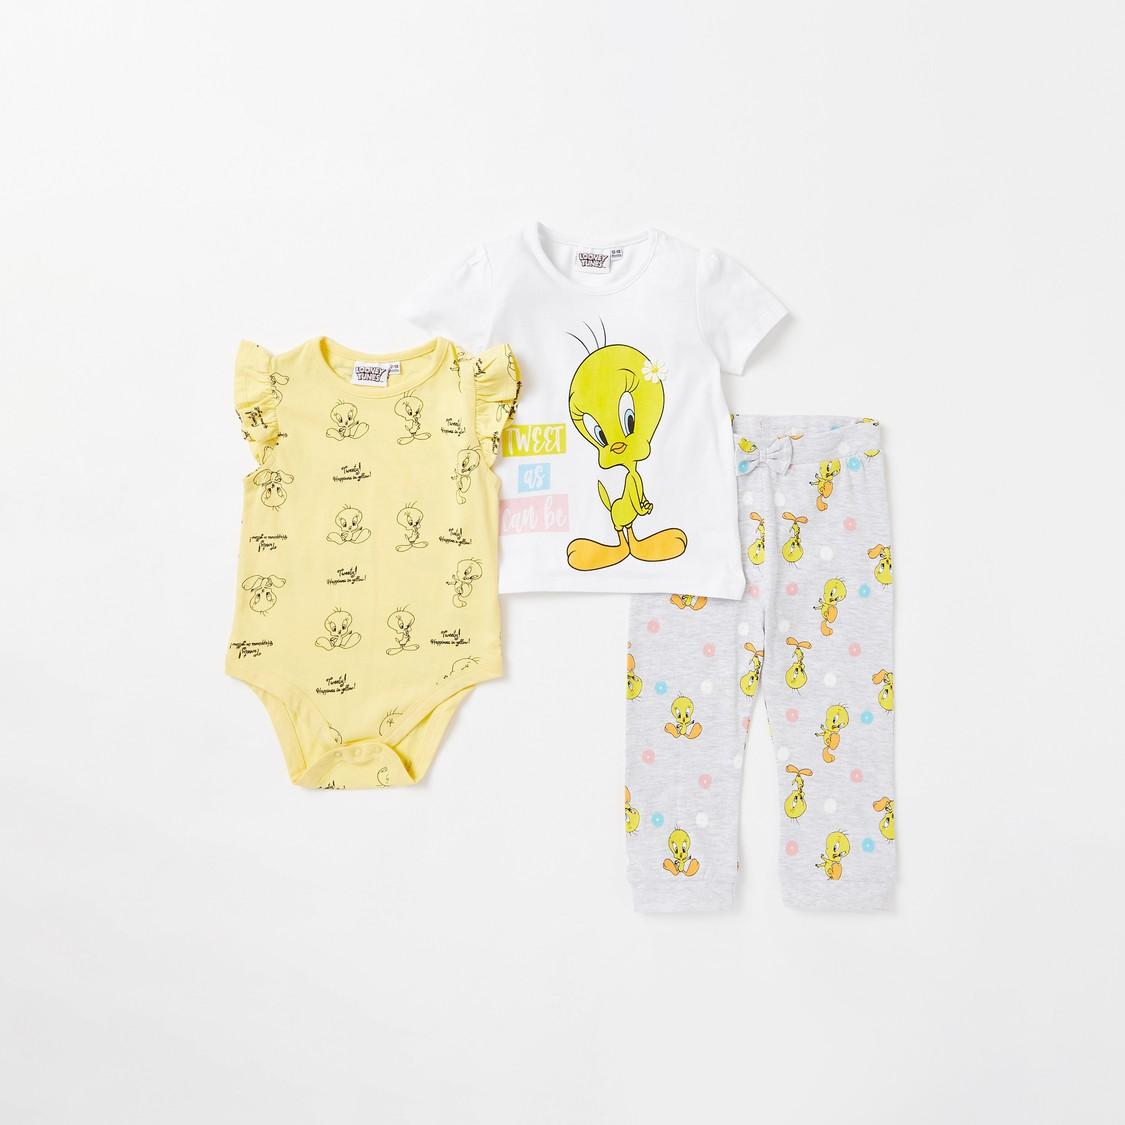 Tweety Print 3-Piece Clothing Set